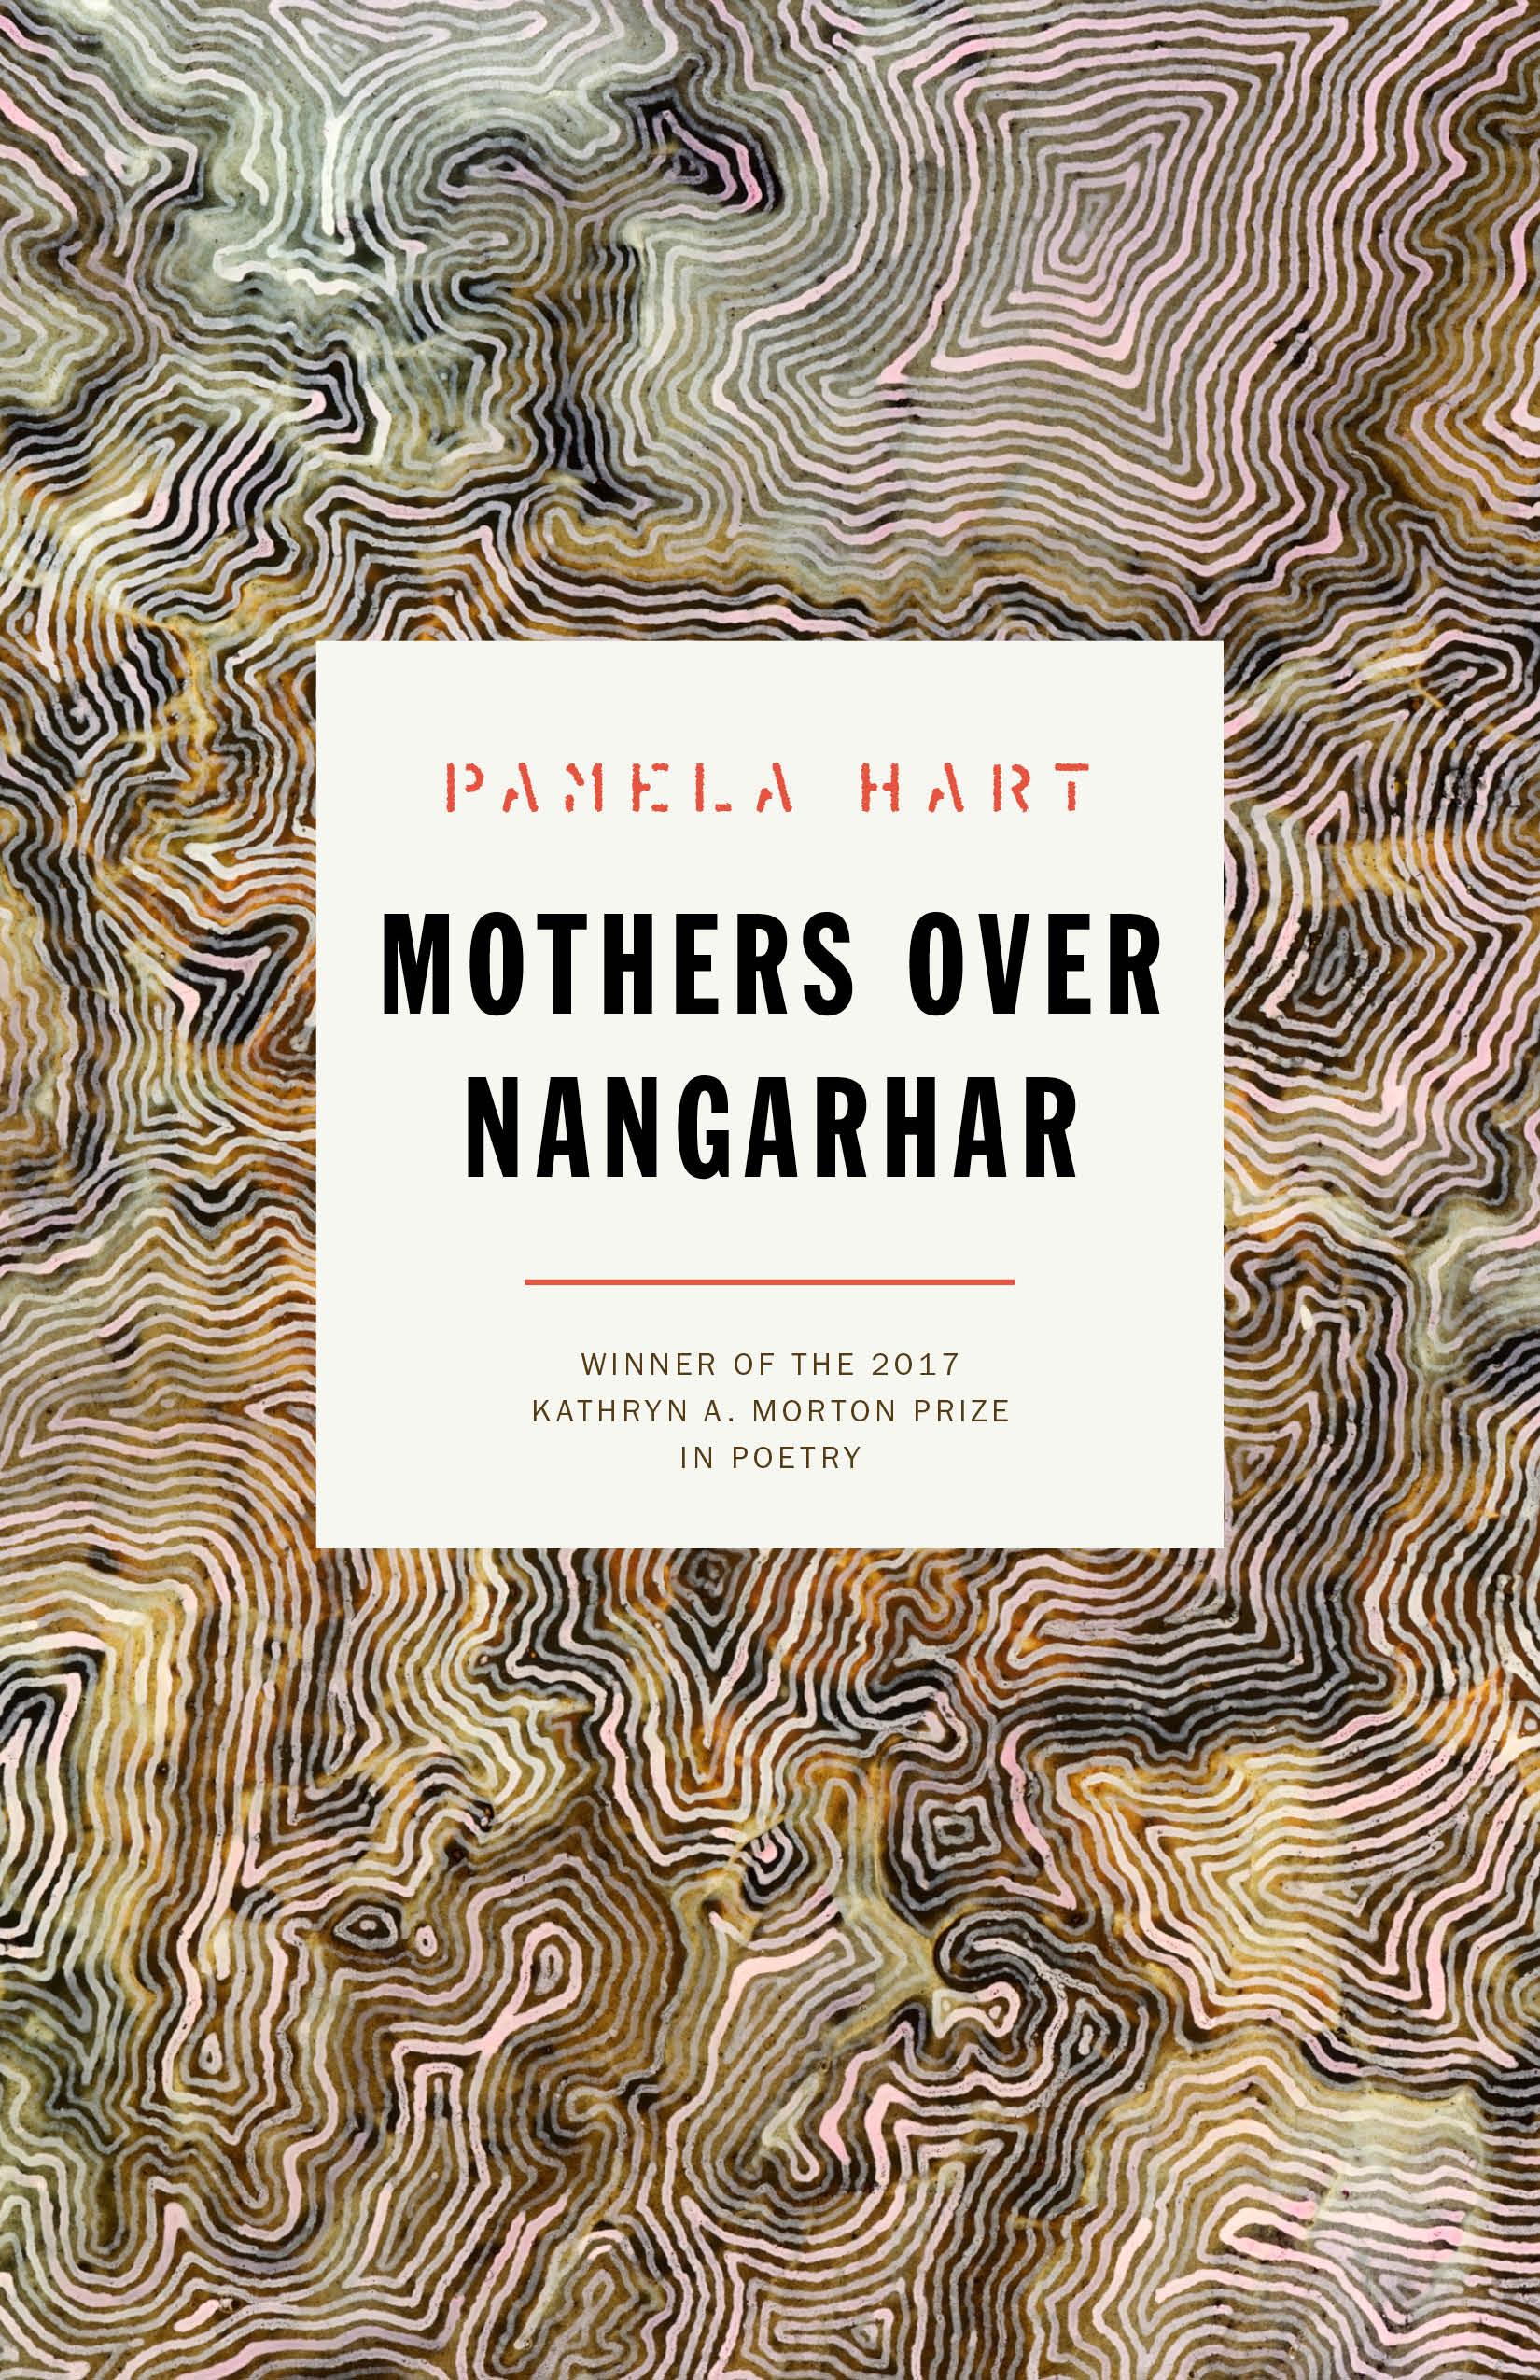 Hart+Mothers+Over+Nangarhar.jpg